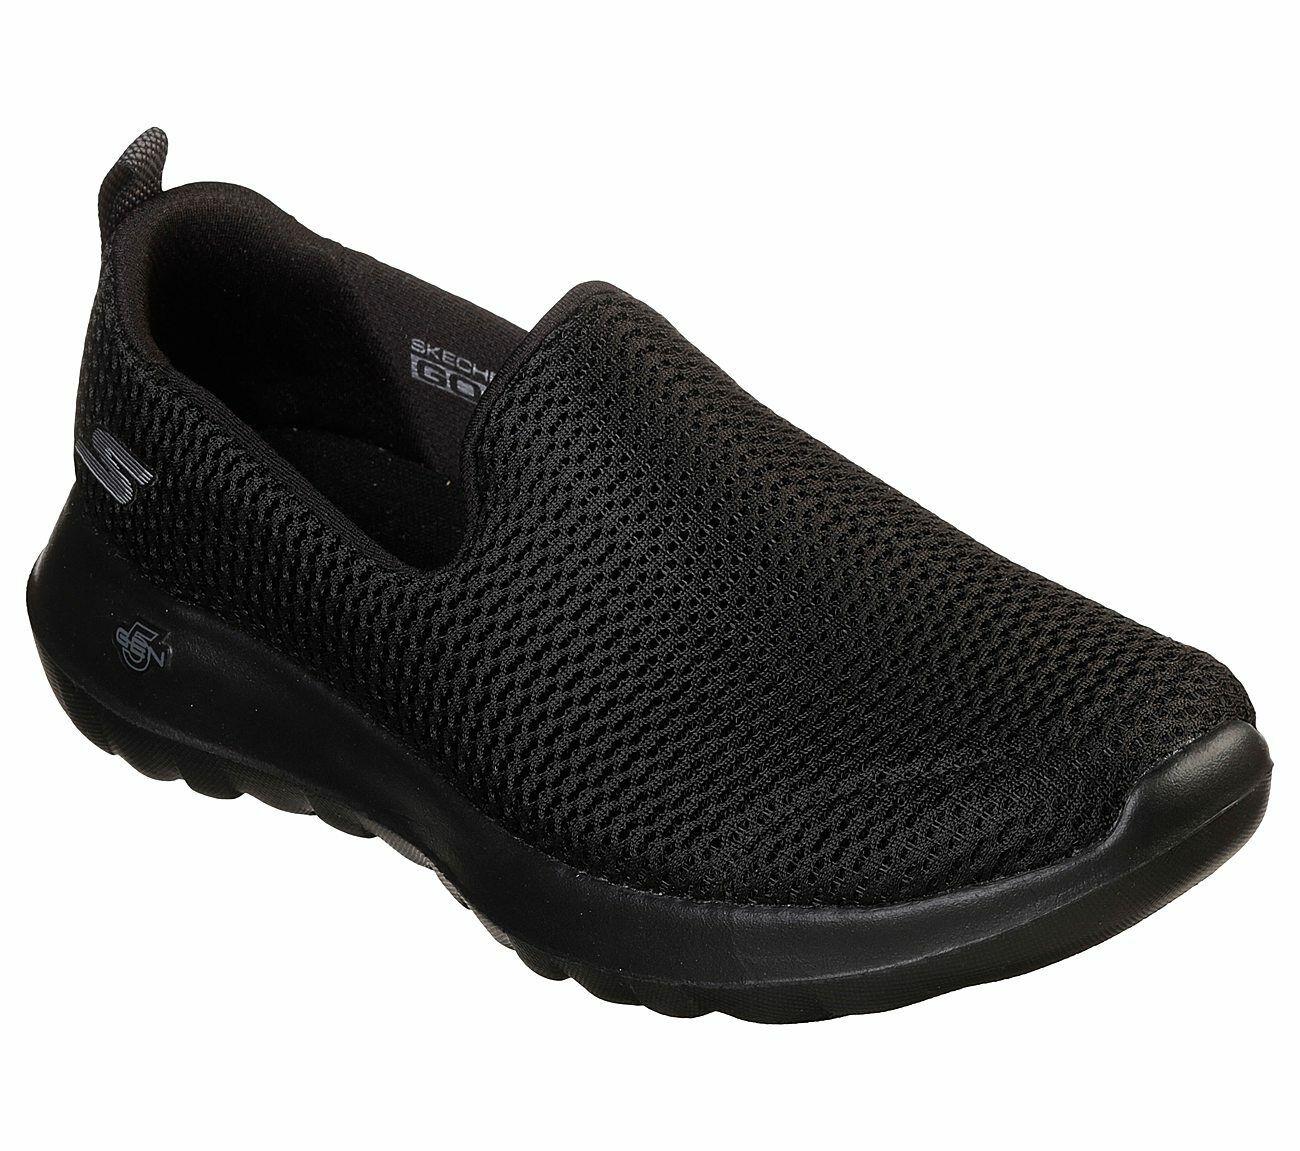 Skechers Shoes Black Go Walk Joy Women's Sport Casual Slip On Comfort Mesh 15600